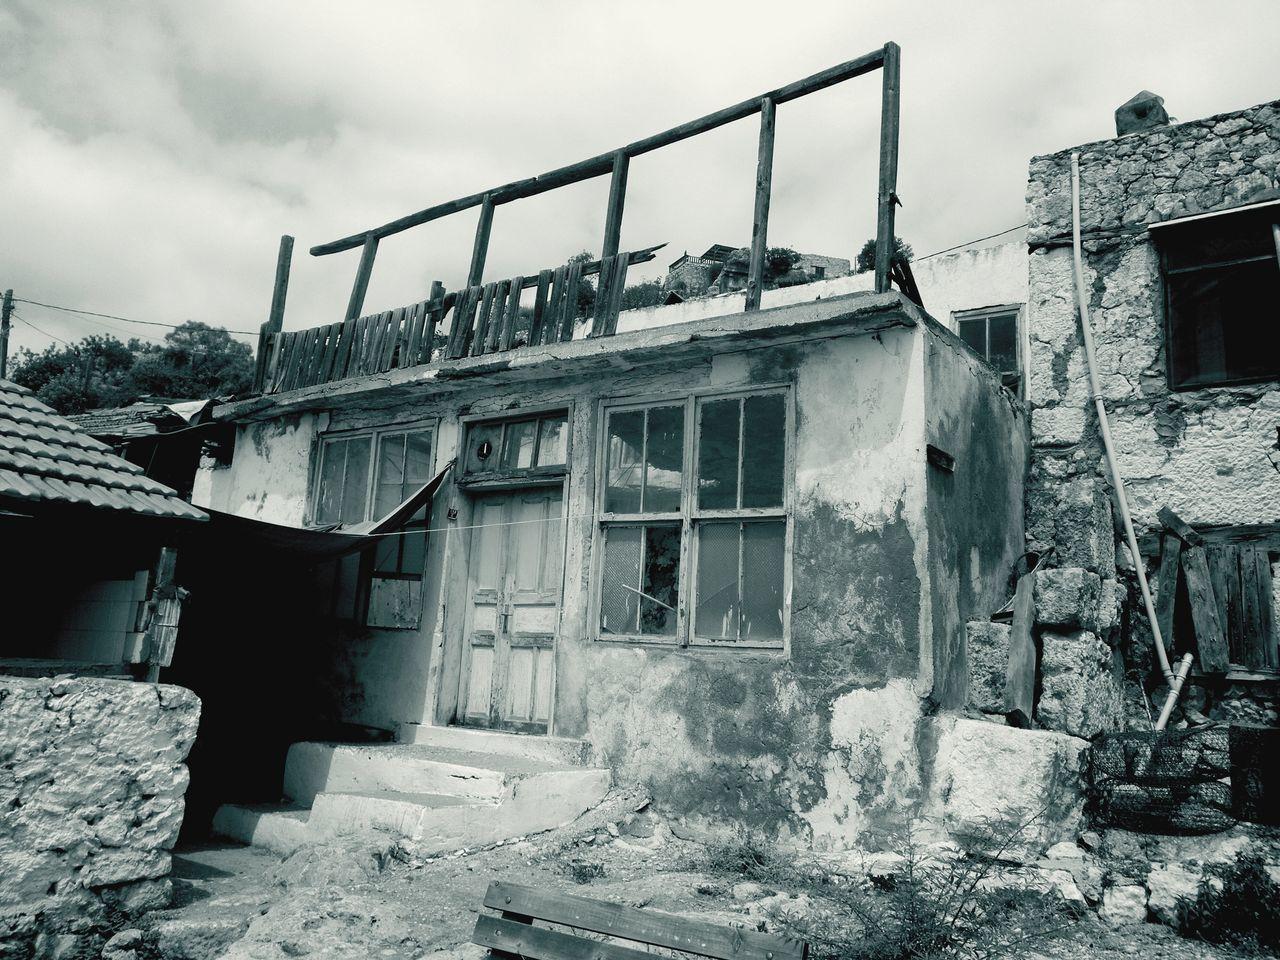 Turkey Village Fishermanvillage House Old House Black & White Monochrome Trip